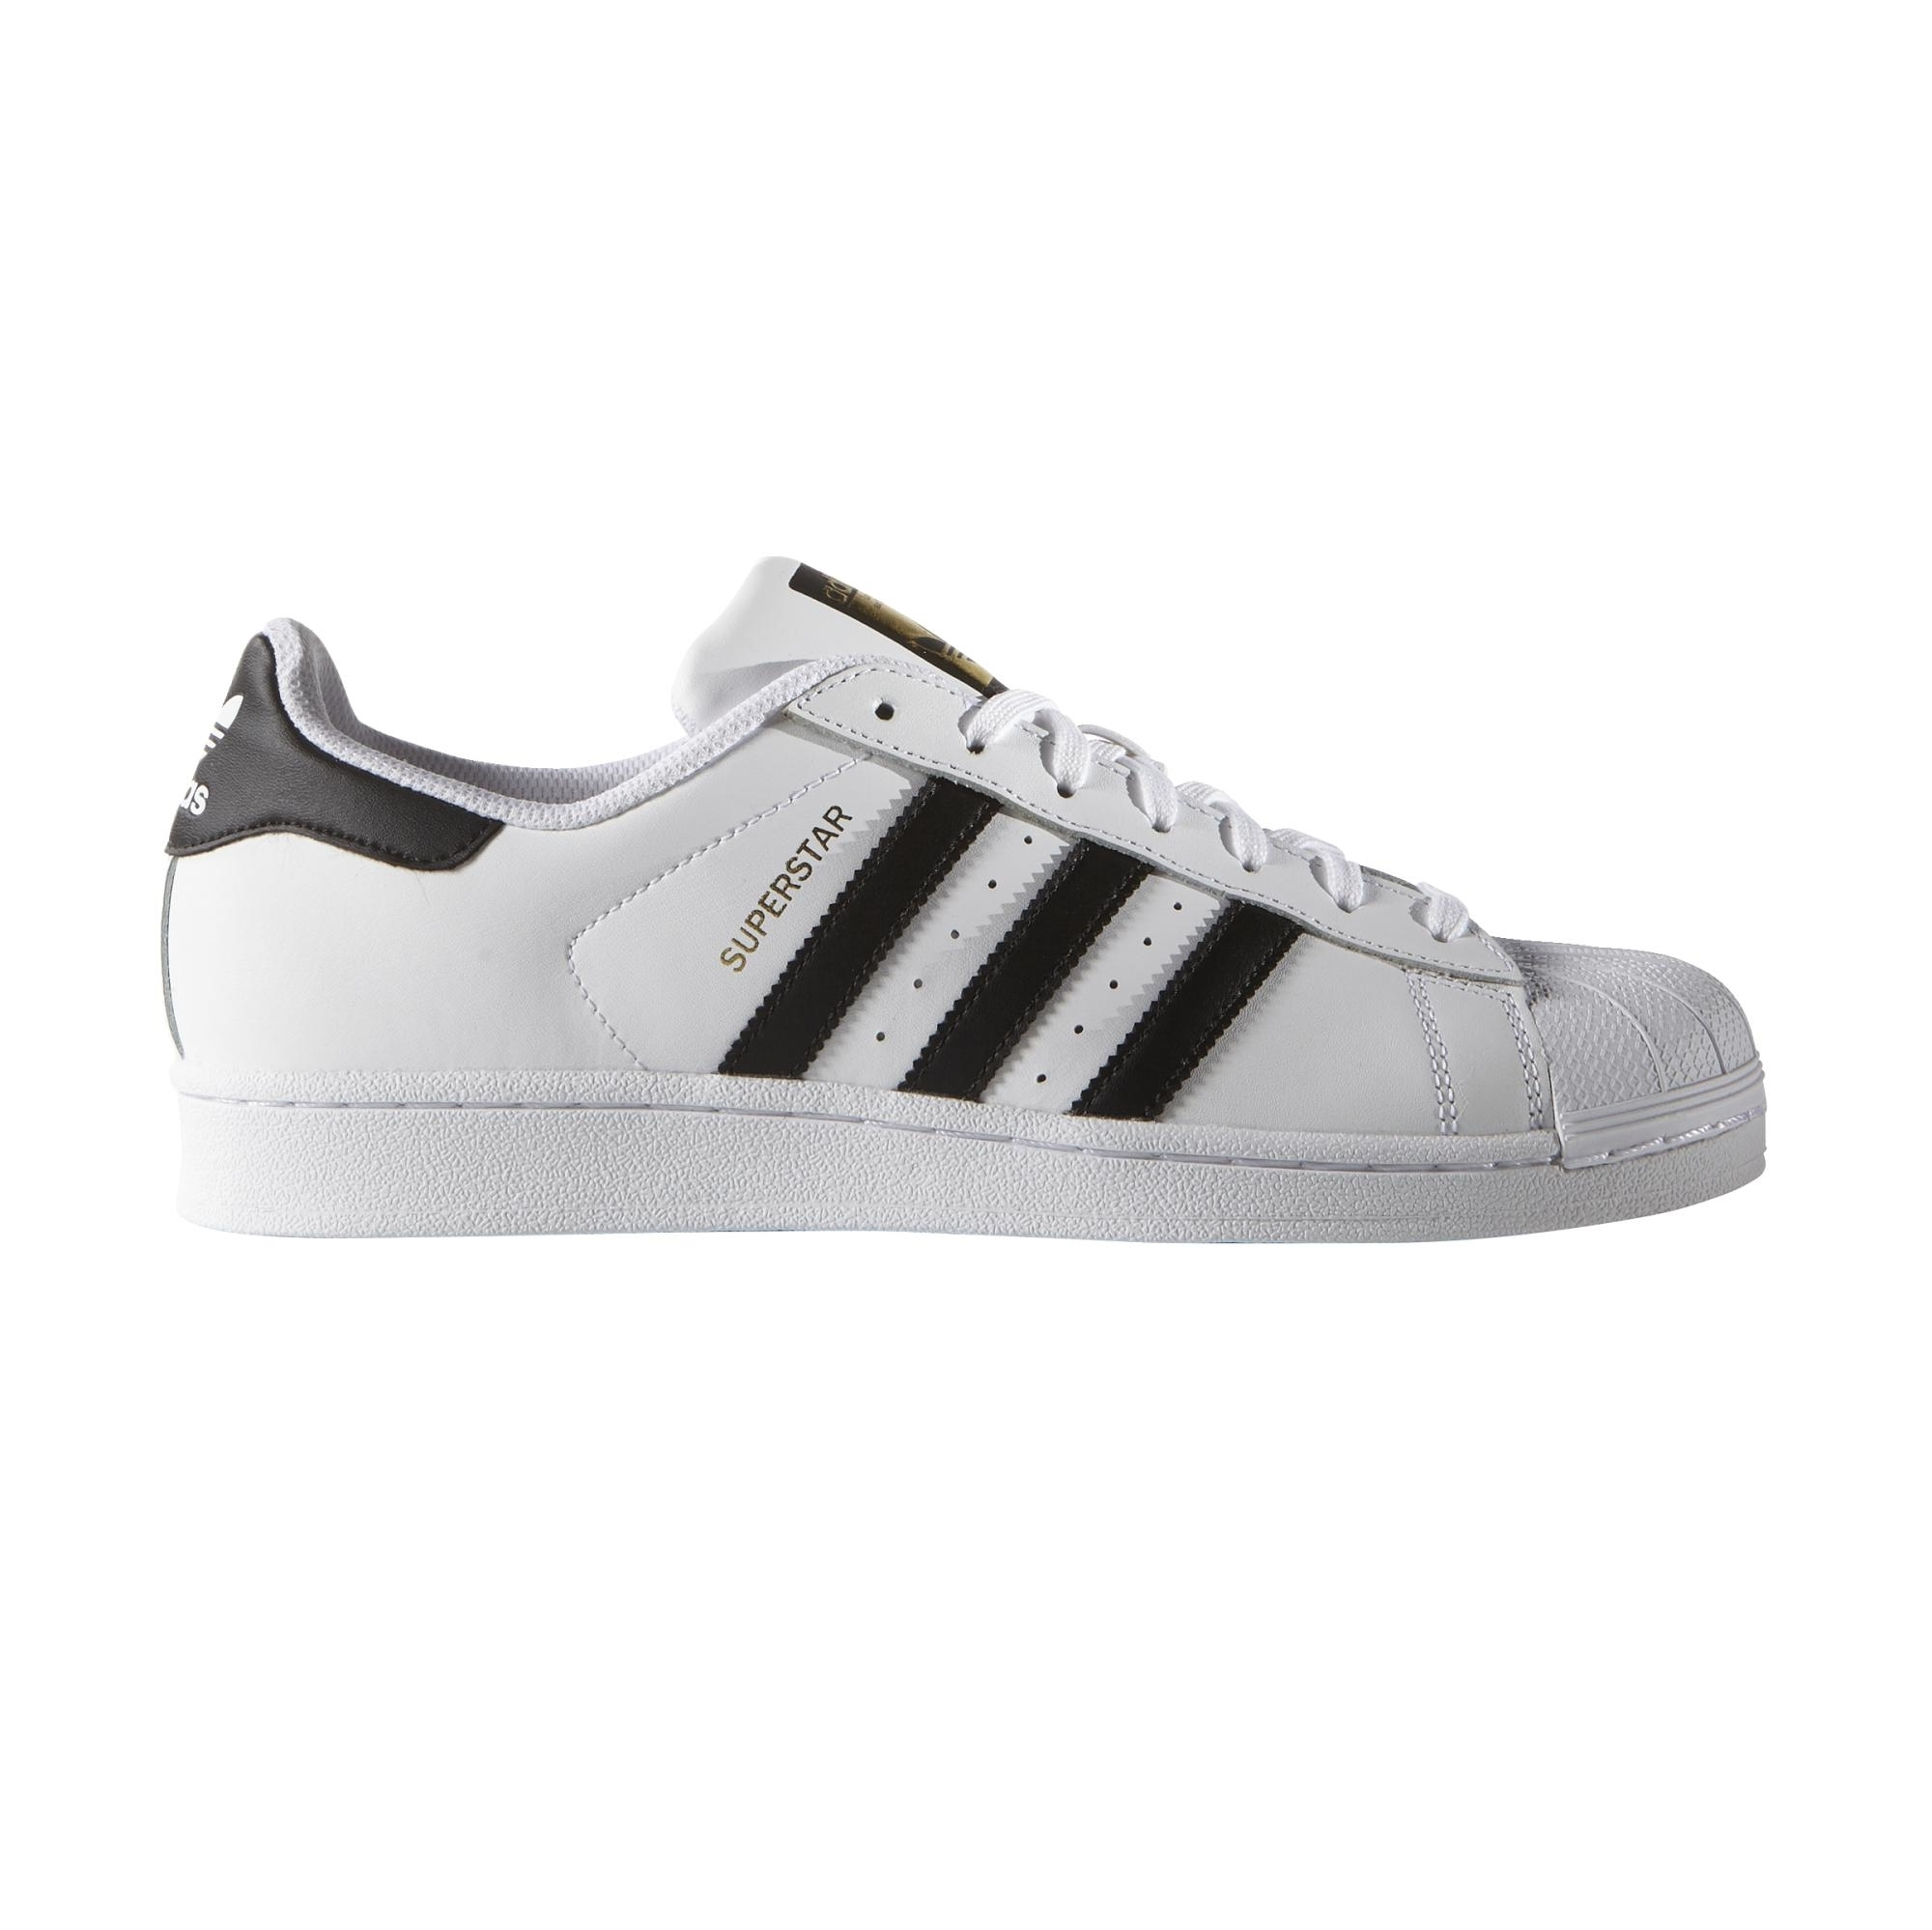 huge discount 7fdb5 30099 ... Adidas Originals Superstar